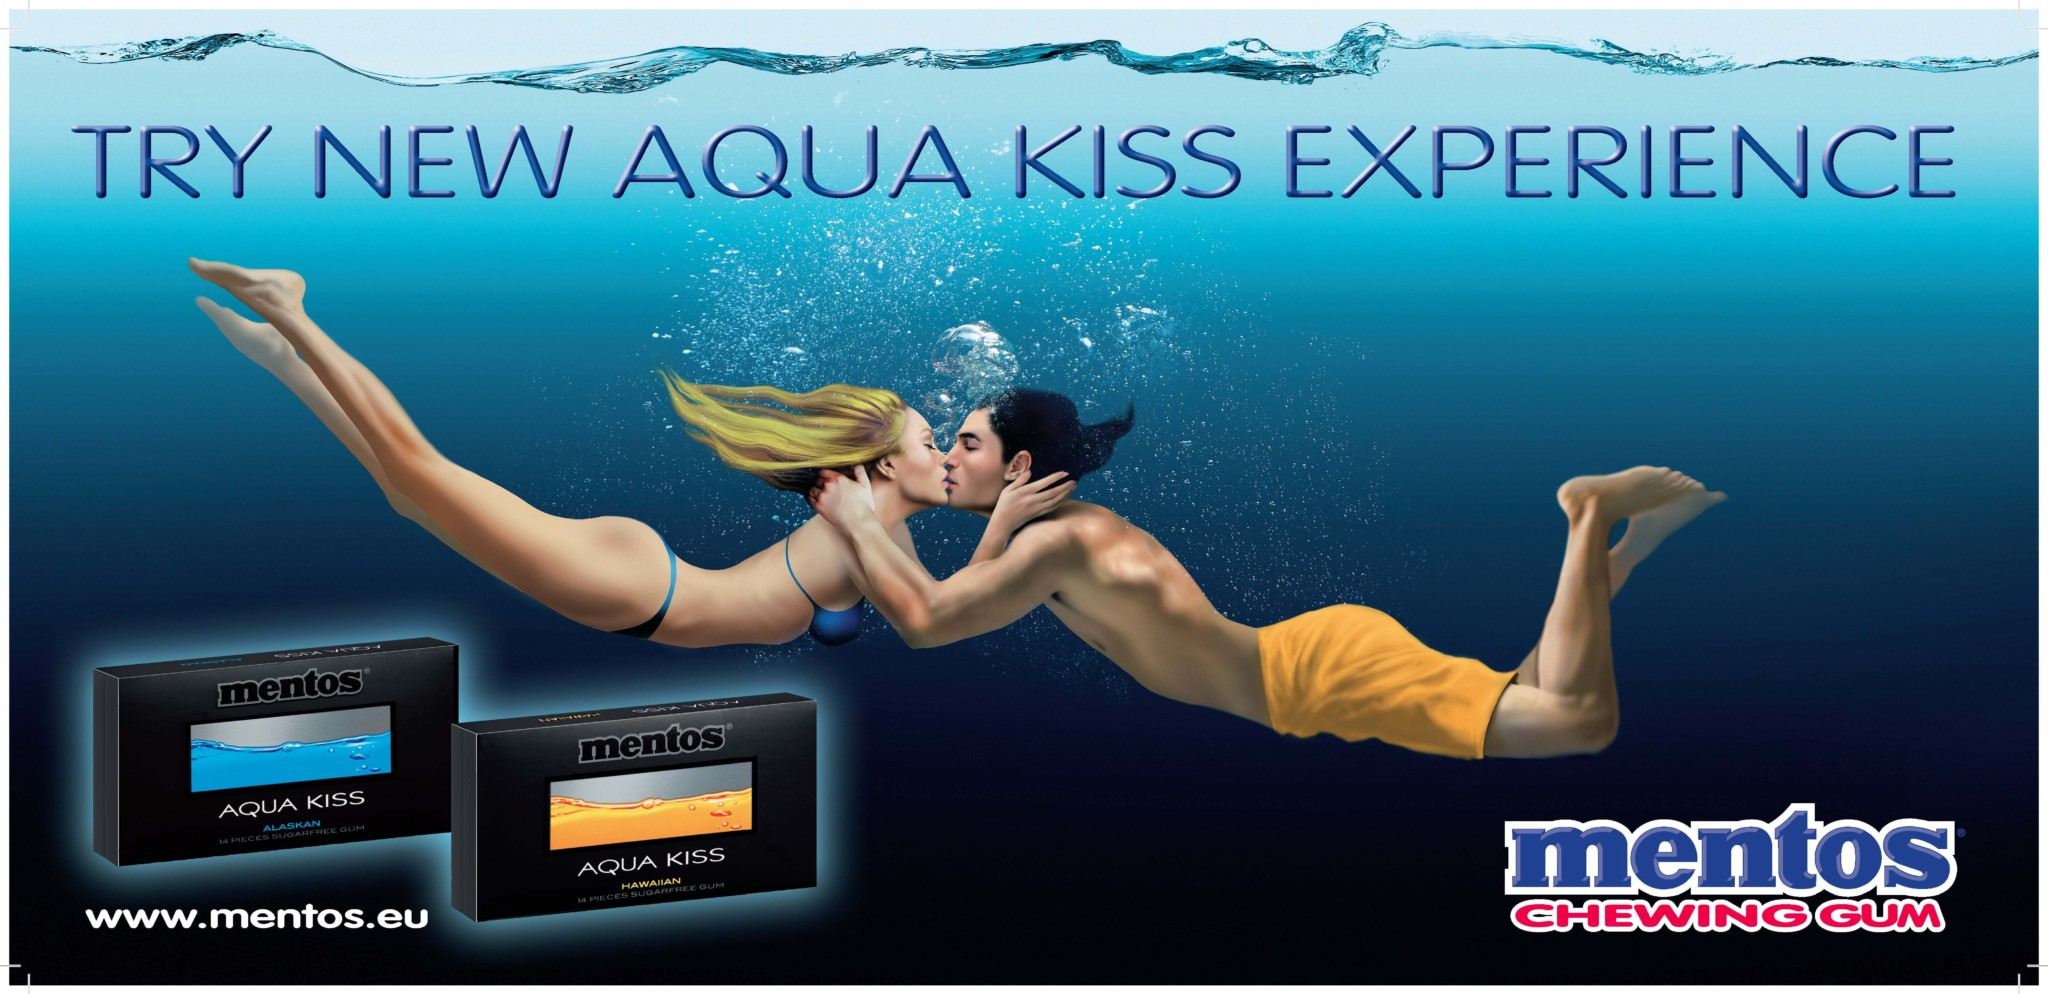 Aqua Kiss žvýkačky _ vizuál kampaně